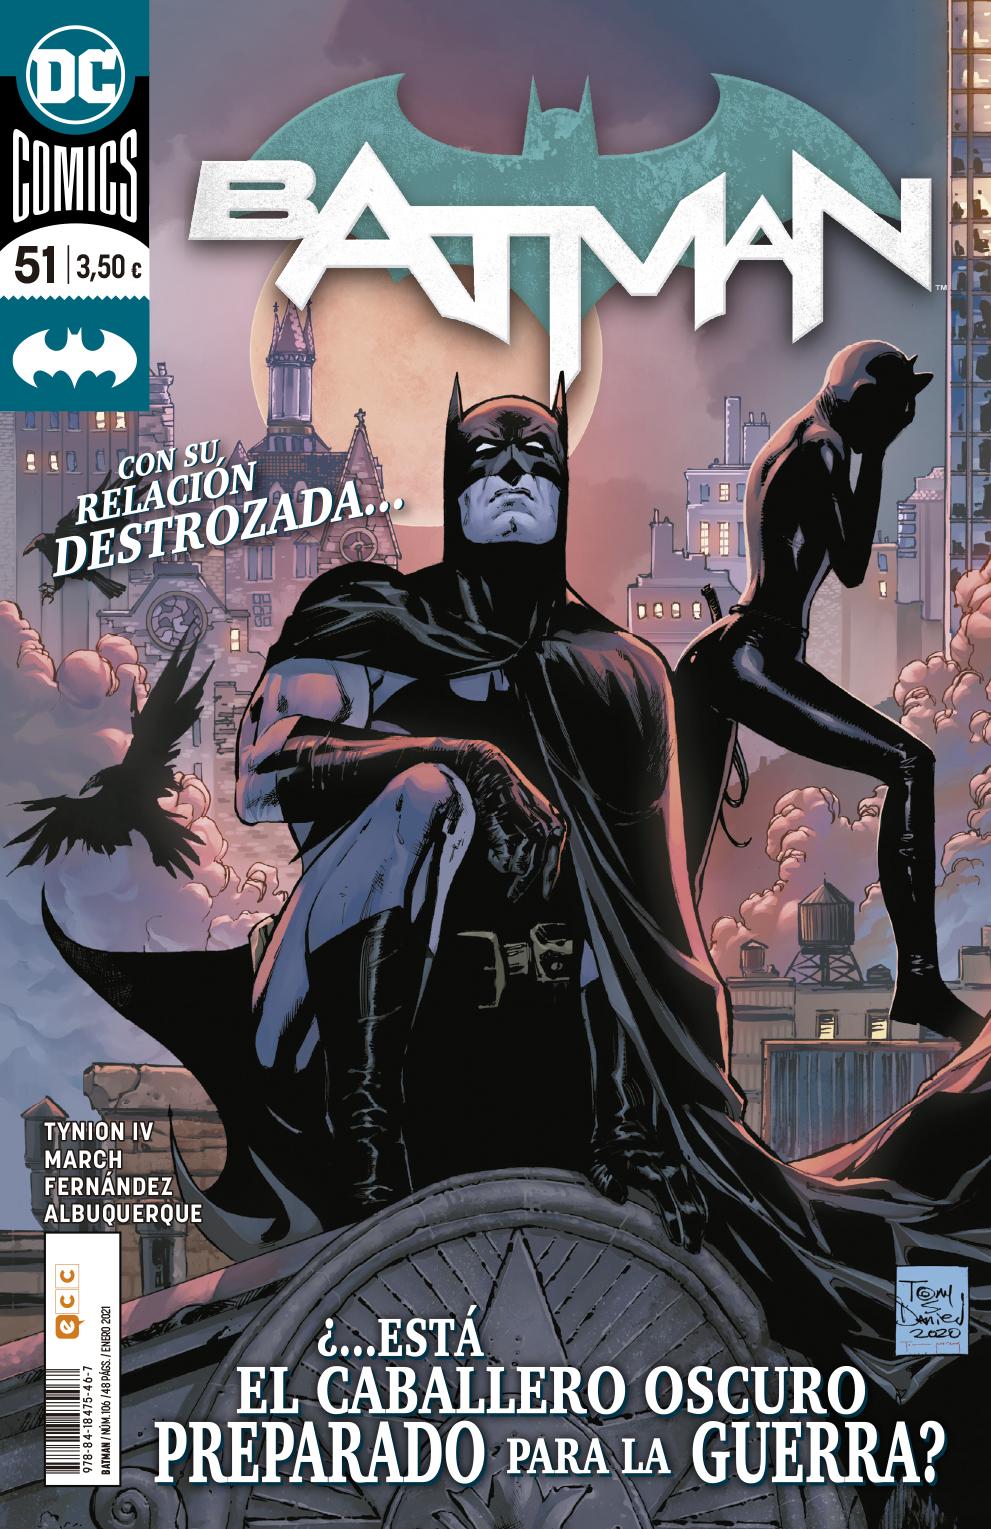 SEGUNDA MANO: Batman núm. 106/51